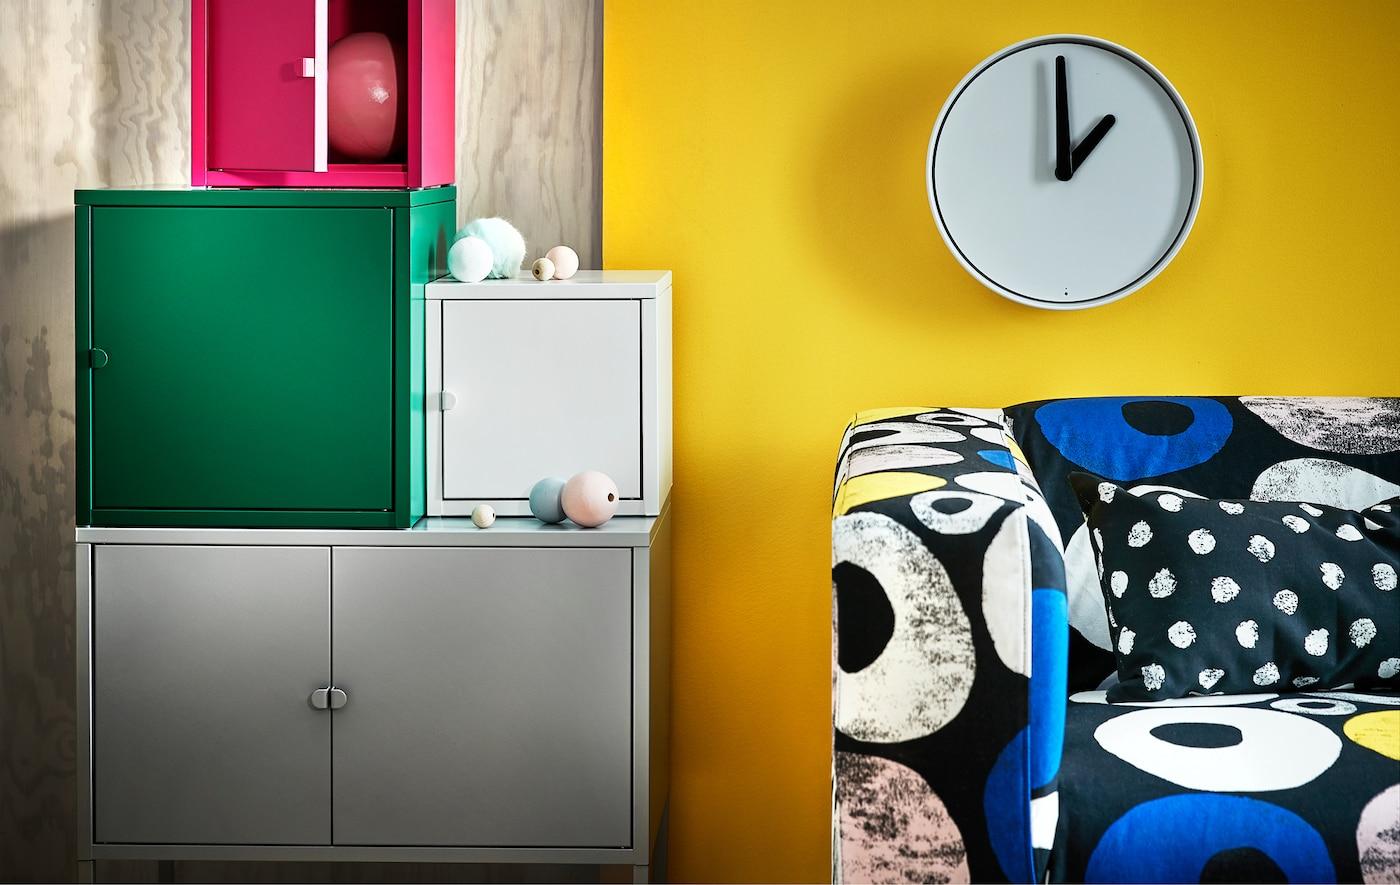 einrichten mit fr hlingsfarben ikea ikea. Black Bedroom Furniture Sets. Home Design Ideas